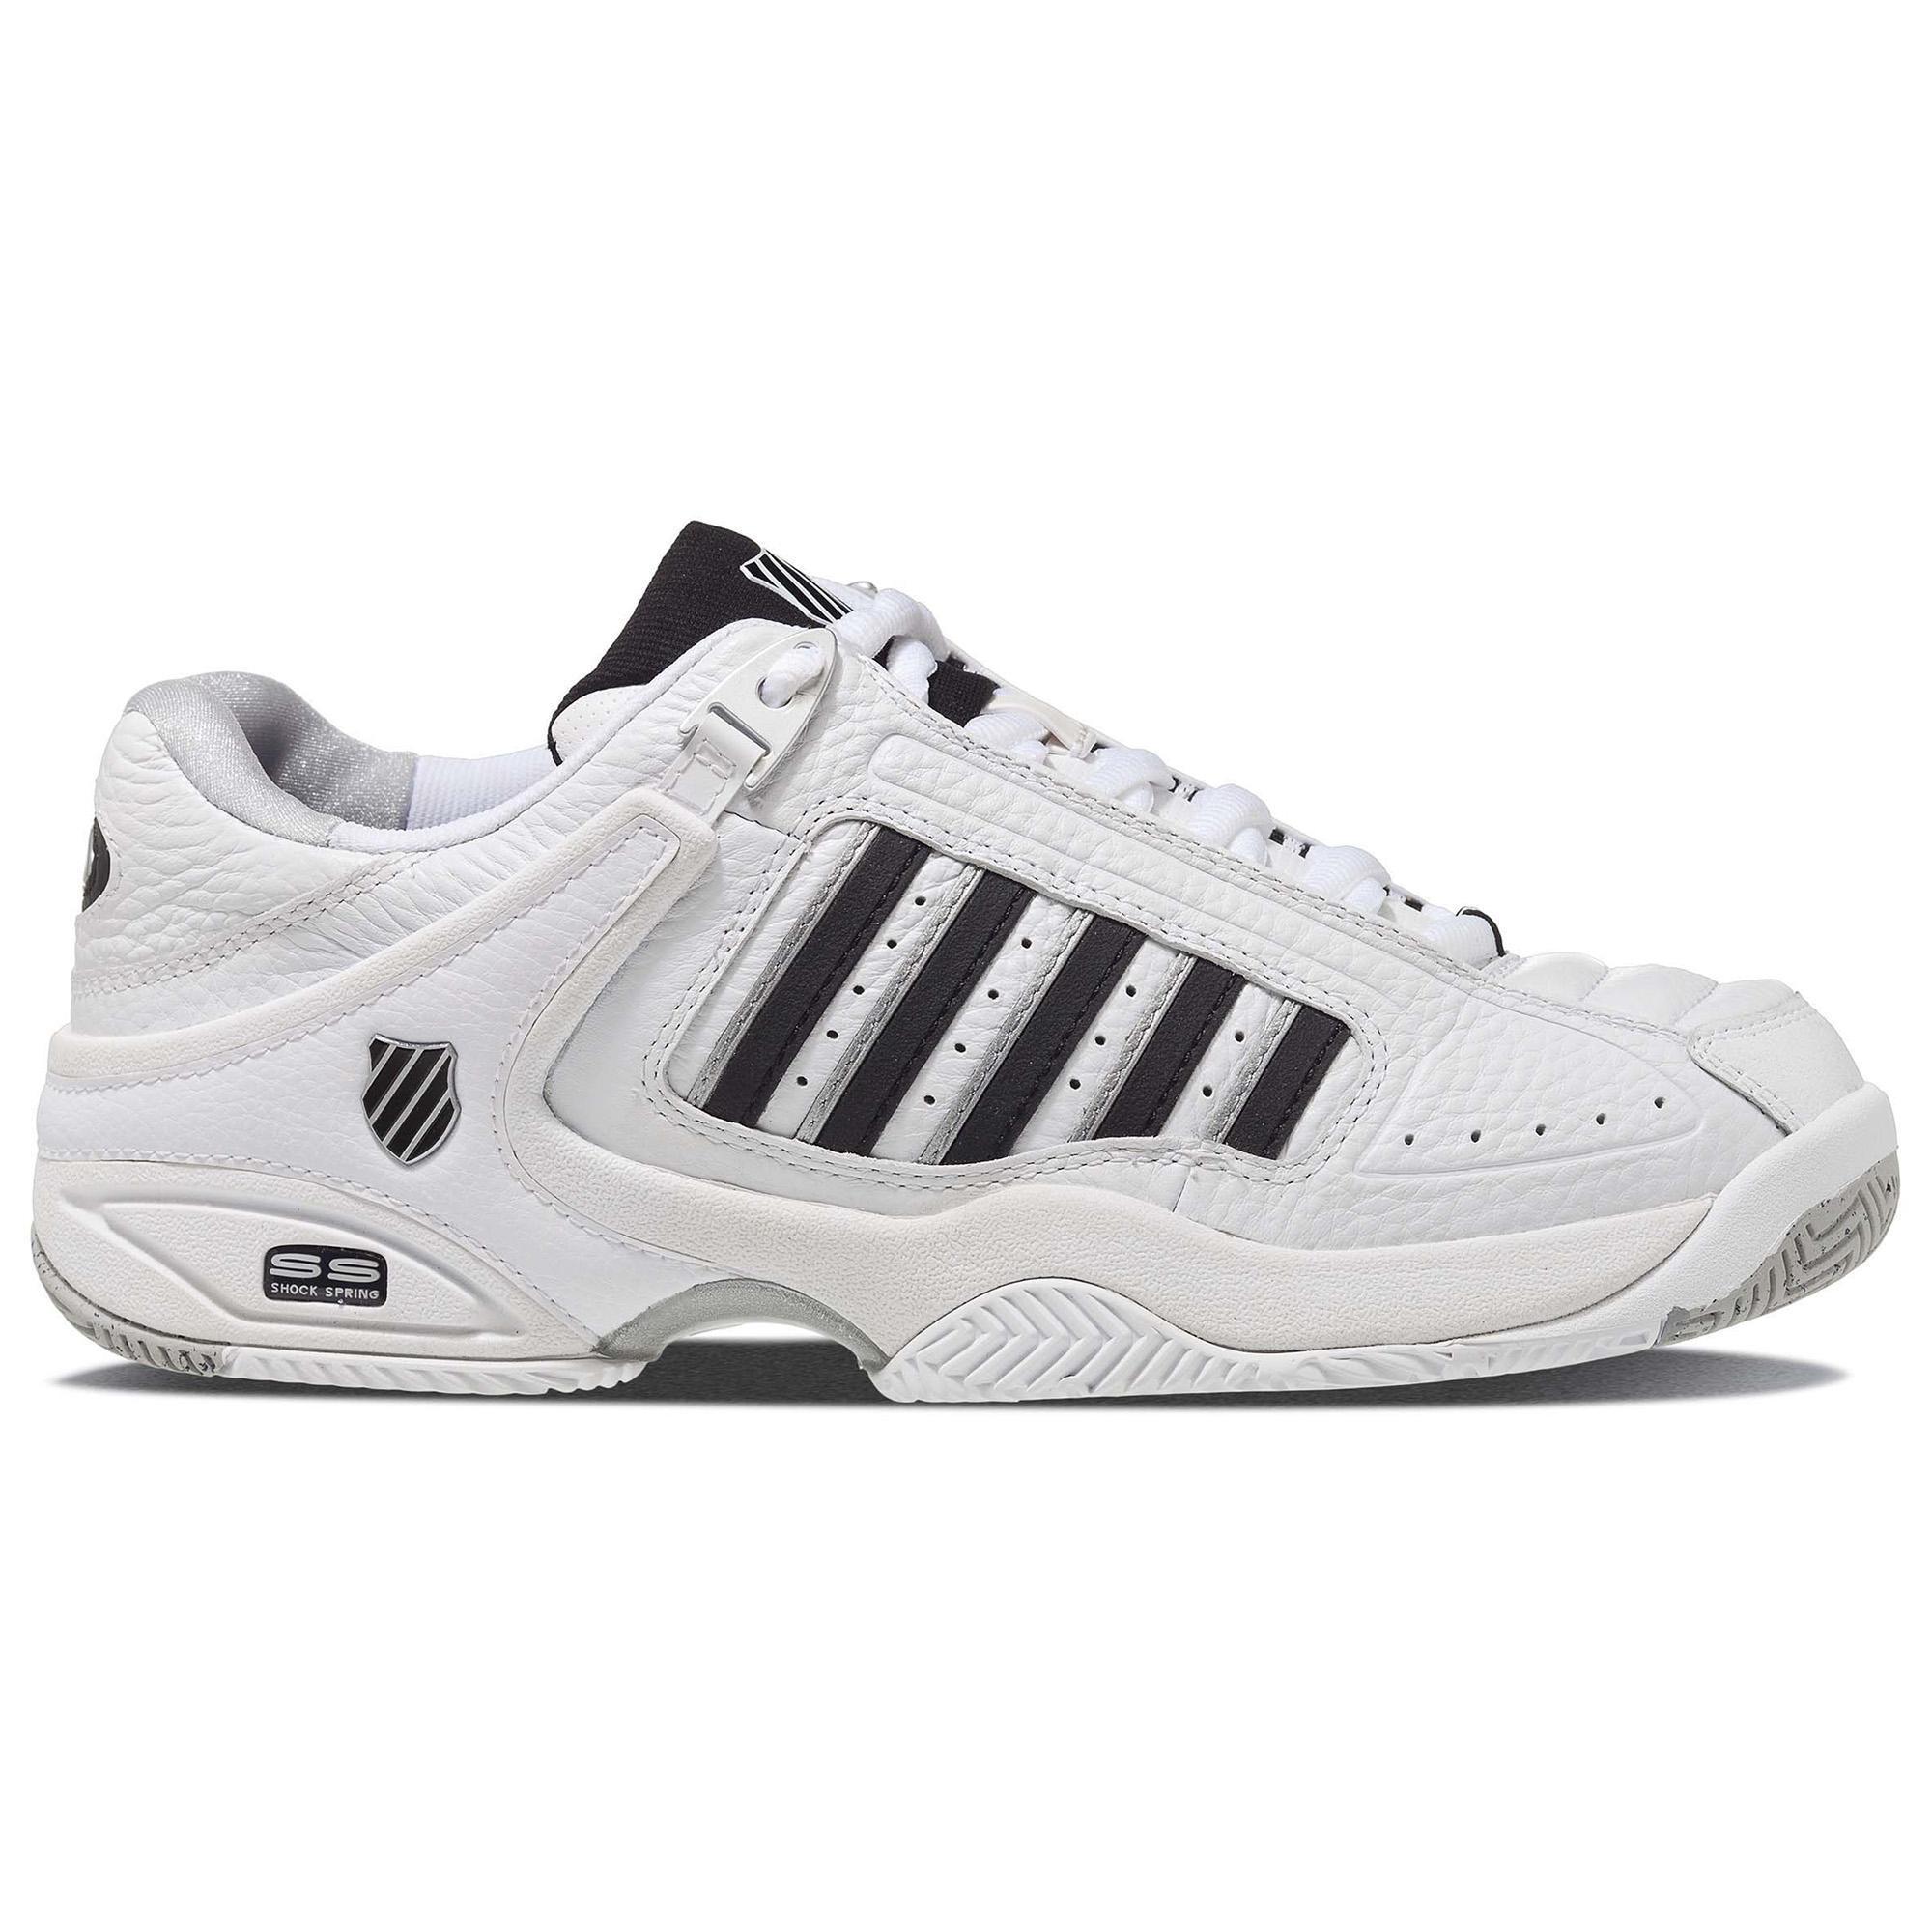 K-Swiss Mens Defier RS Tennis Shoes - White Black - Tennisnuts.com 00ff174d0dab